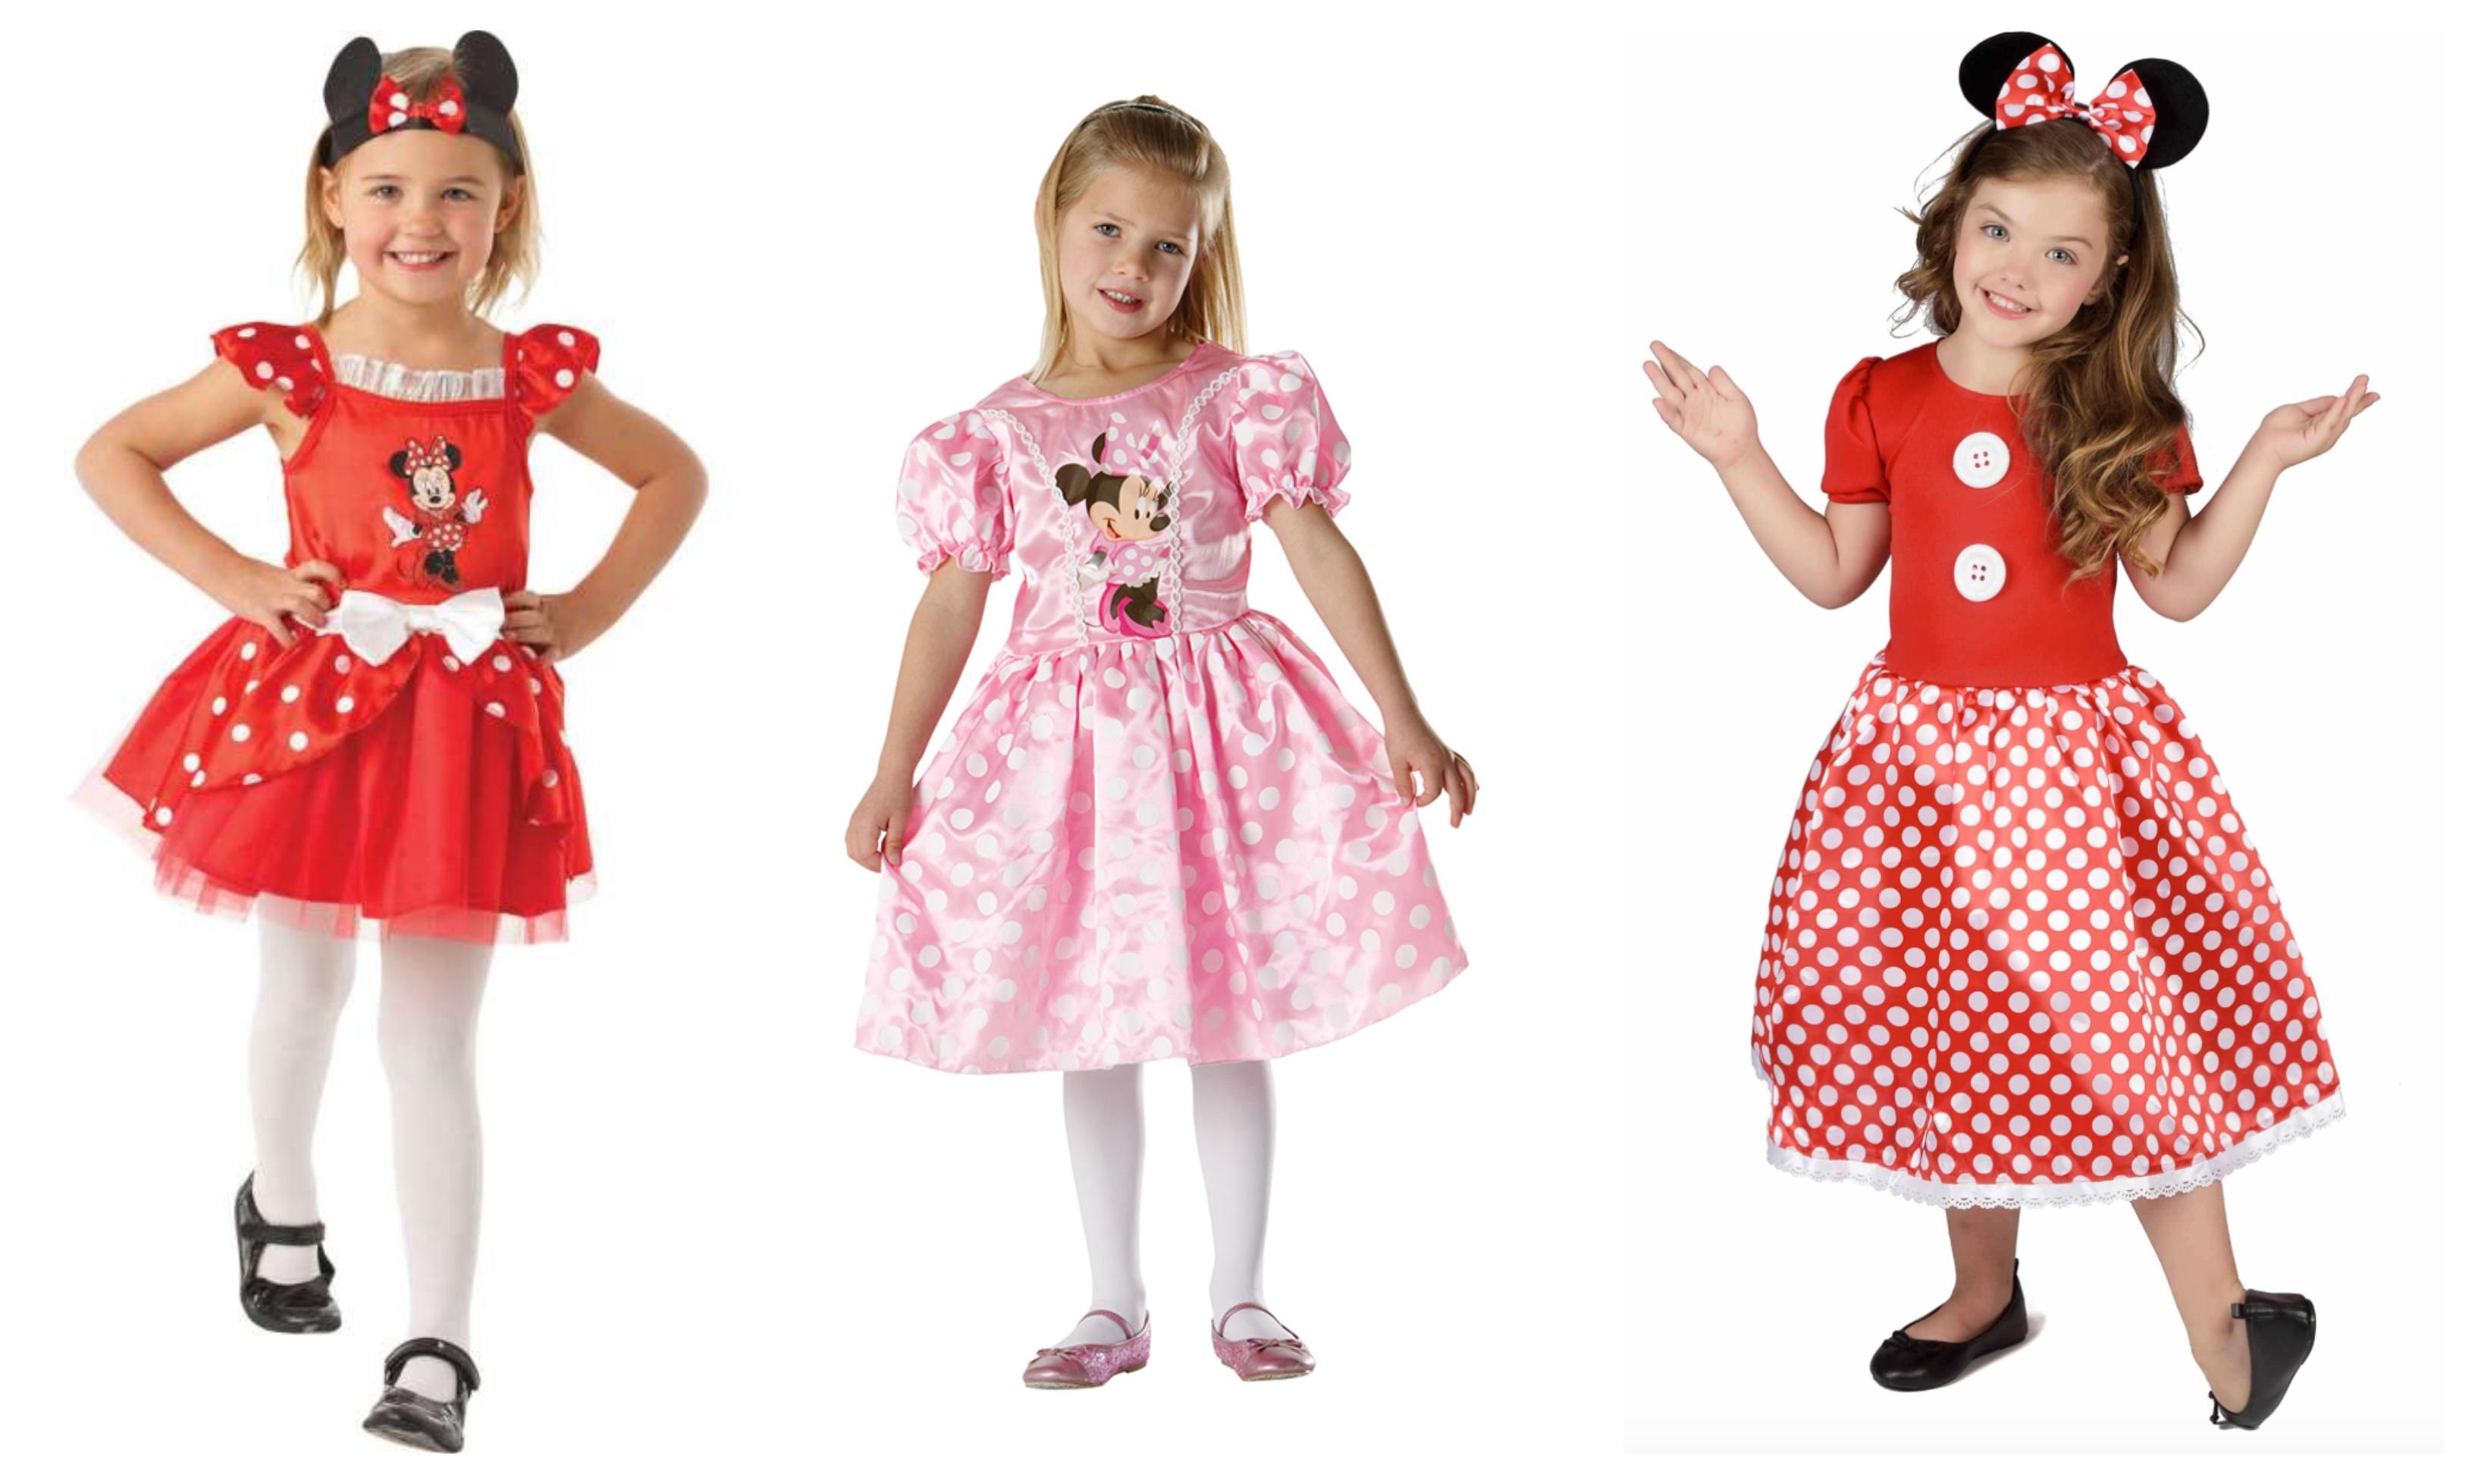 minnie mouse kostume til børn, minnie mouse udklædning til børn, minnie mouse tøj til børn, minnie mouse kjole til børn, minne mouse børnekostumer, minnie mouse fastelavnskostume, disney kostume, minnie mouse gave, disney gave, alletiders disney